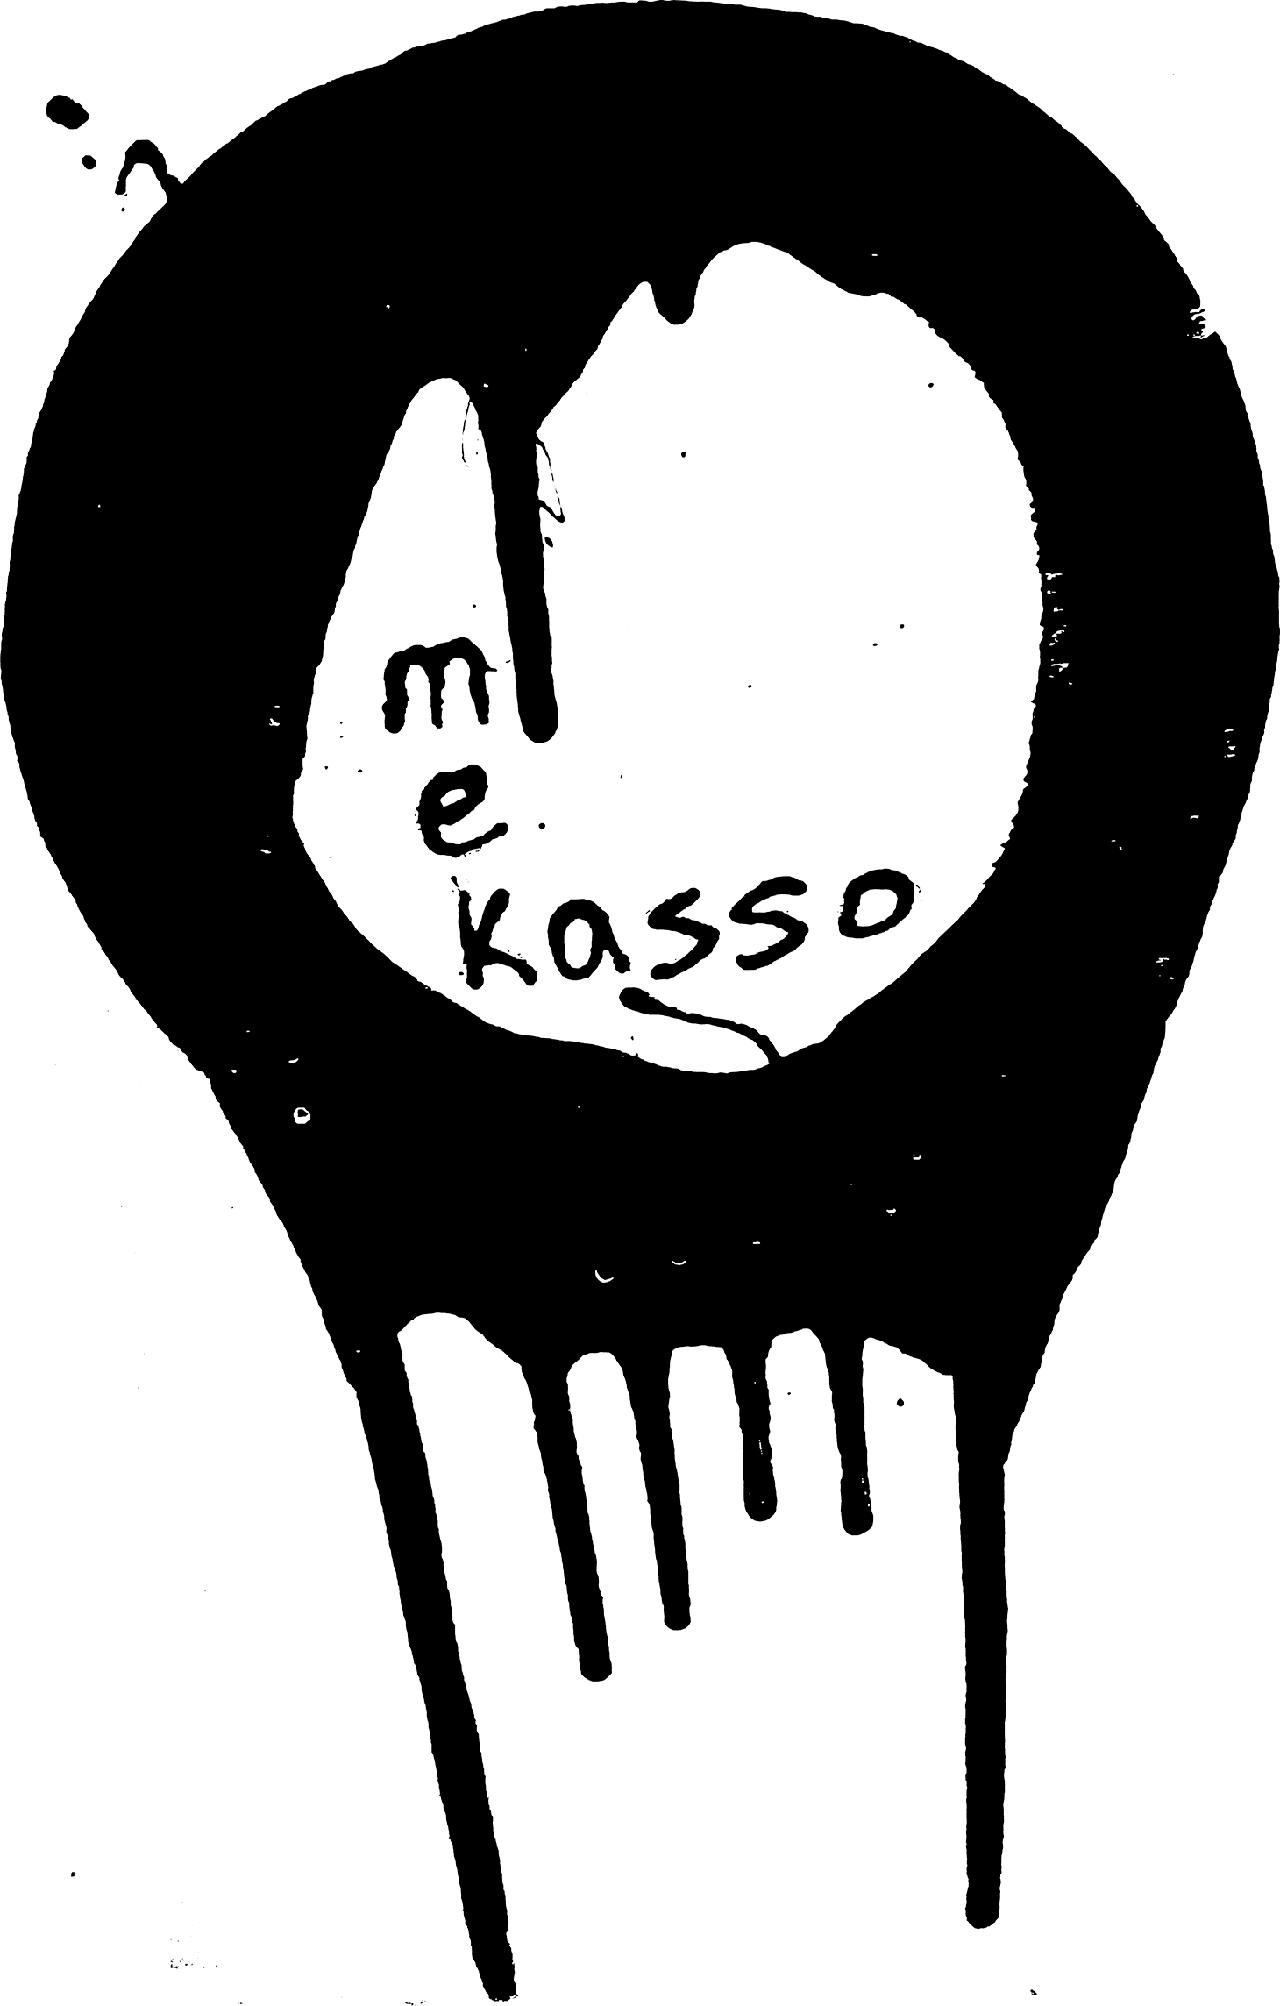 Mekasso signature